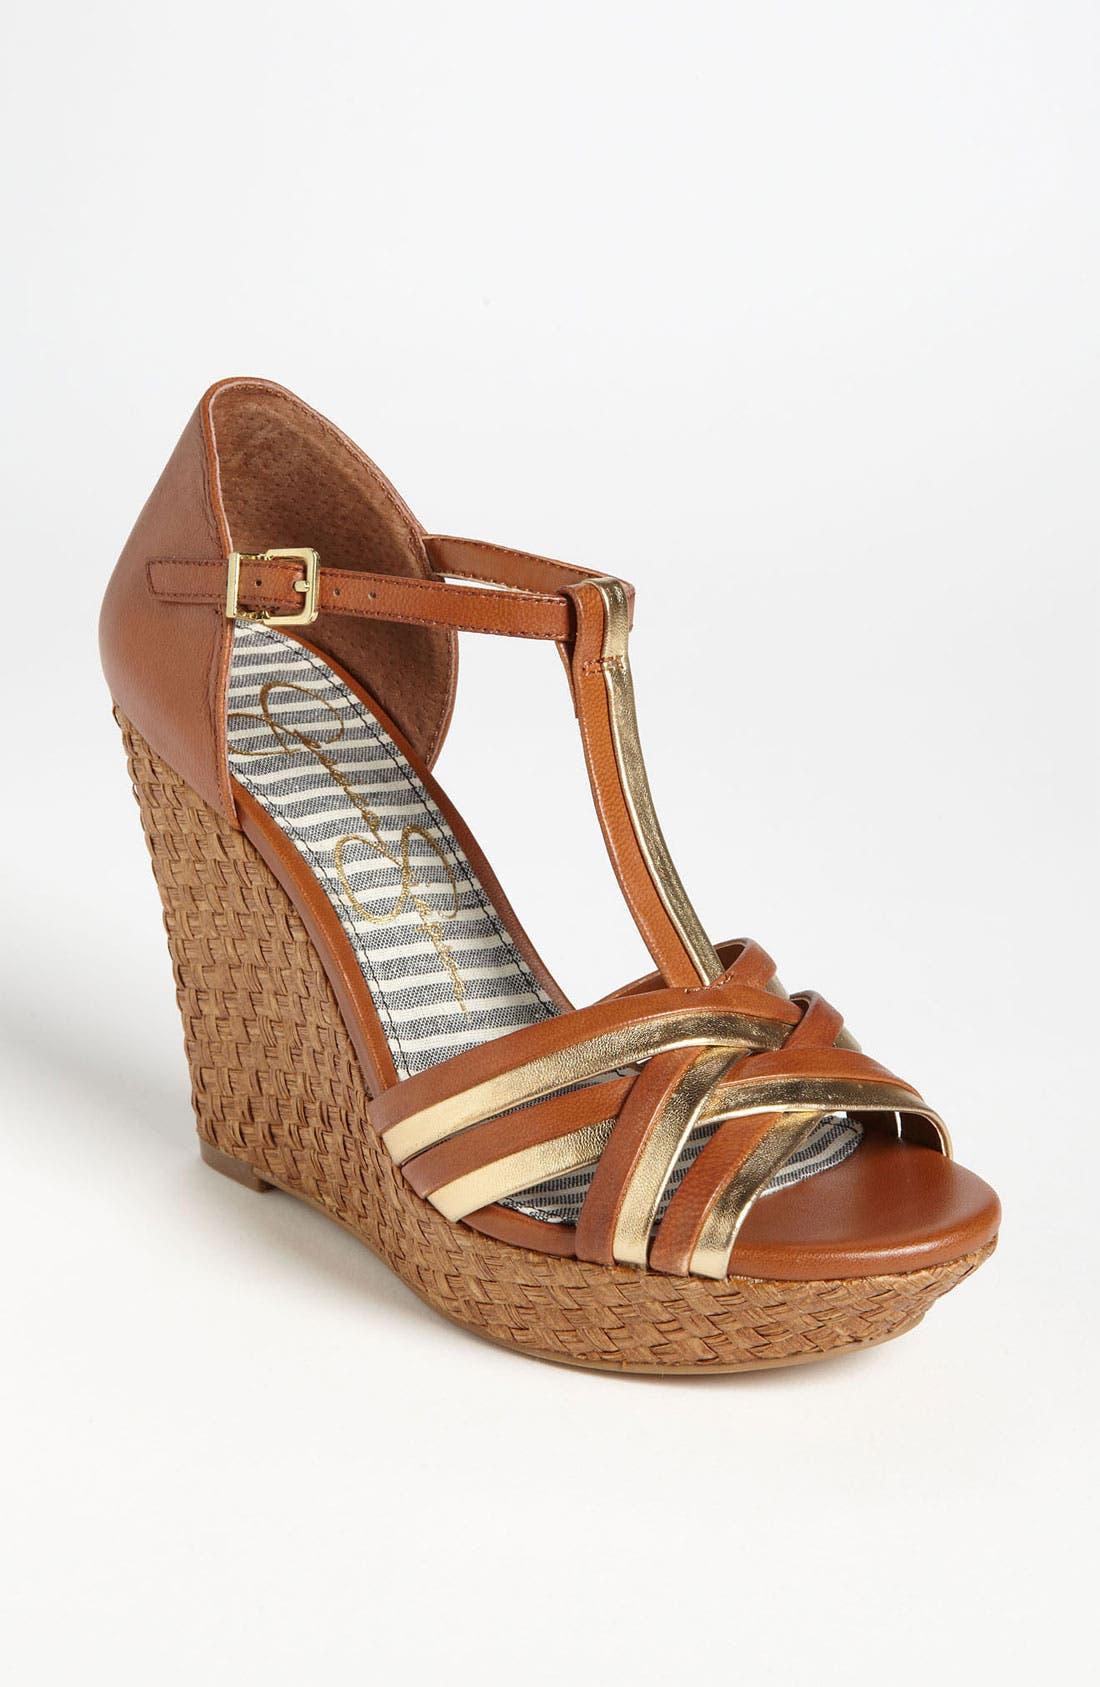 Main Image - Jessica Simpson 'Calista' Sandal (Nordstrom Exclusive)